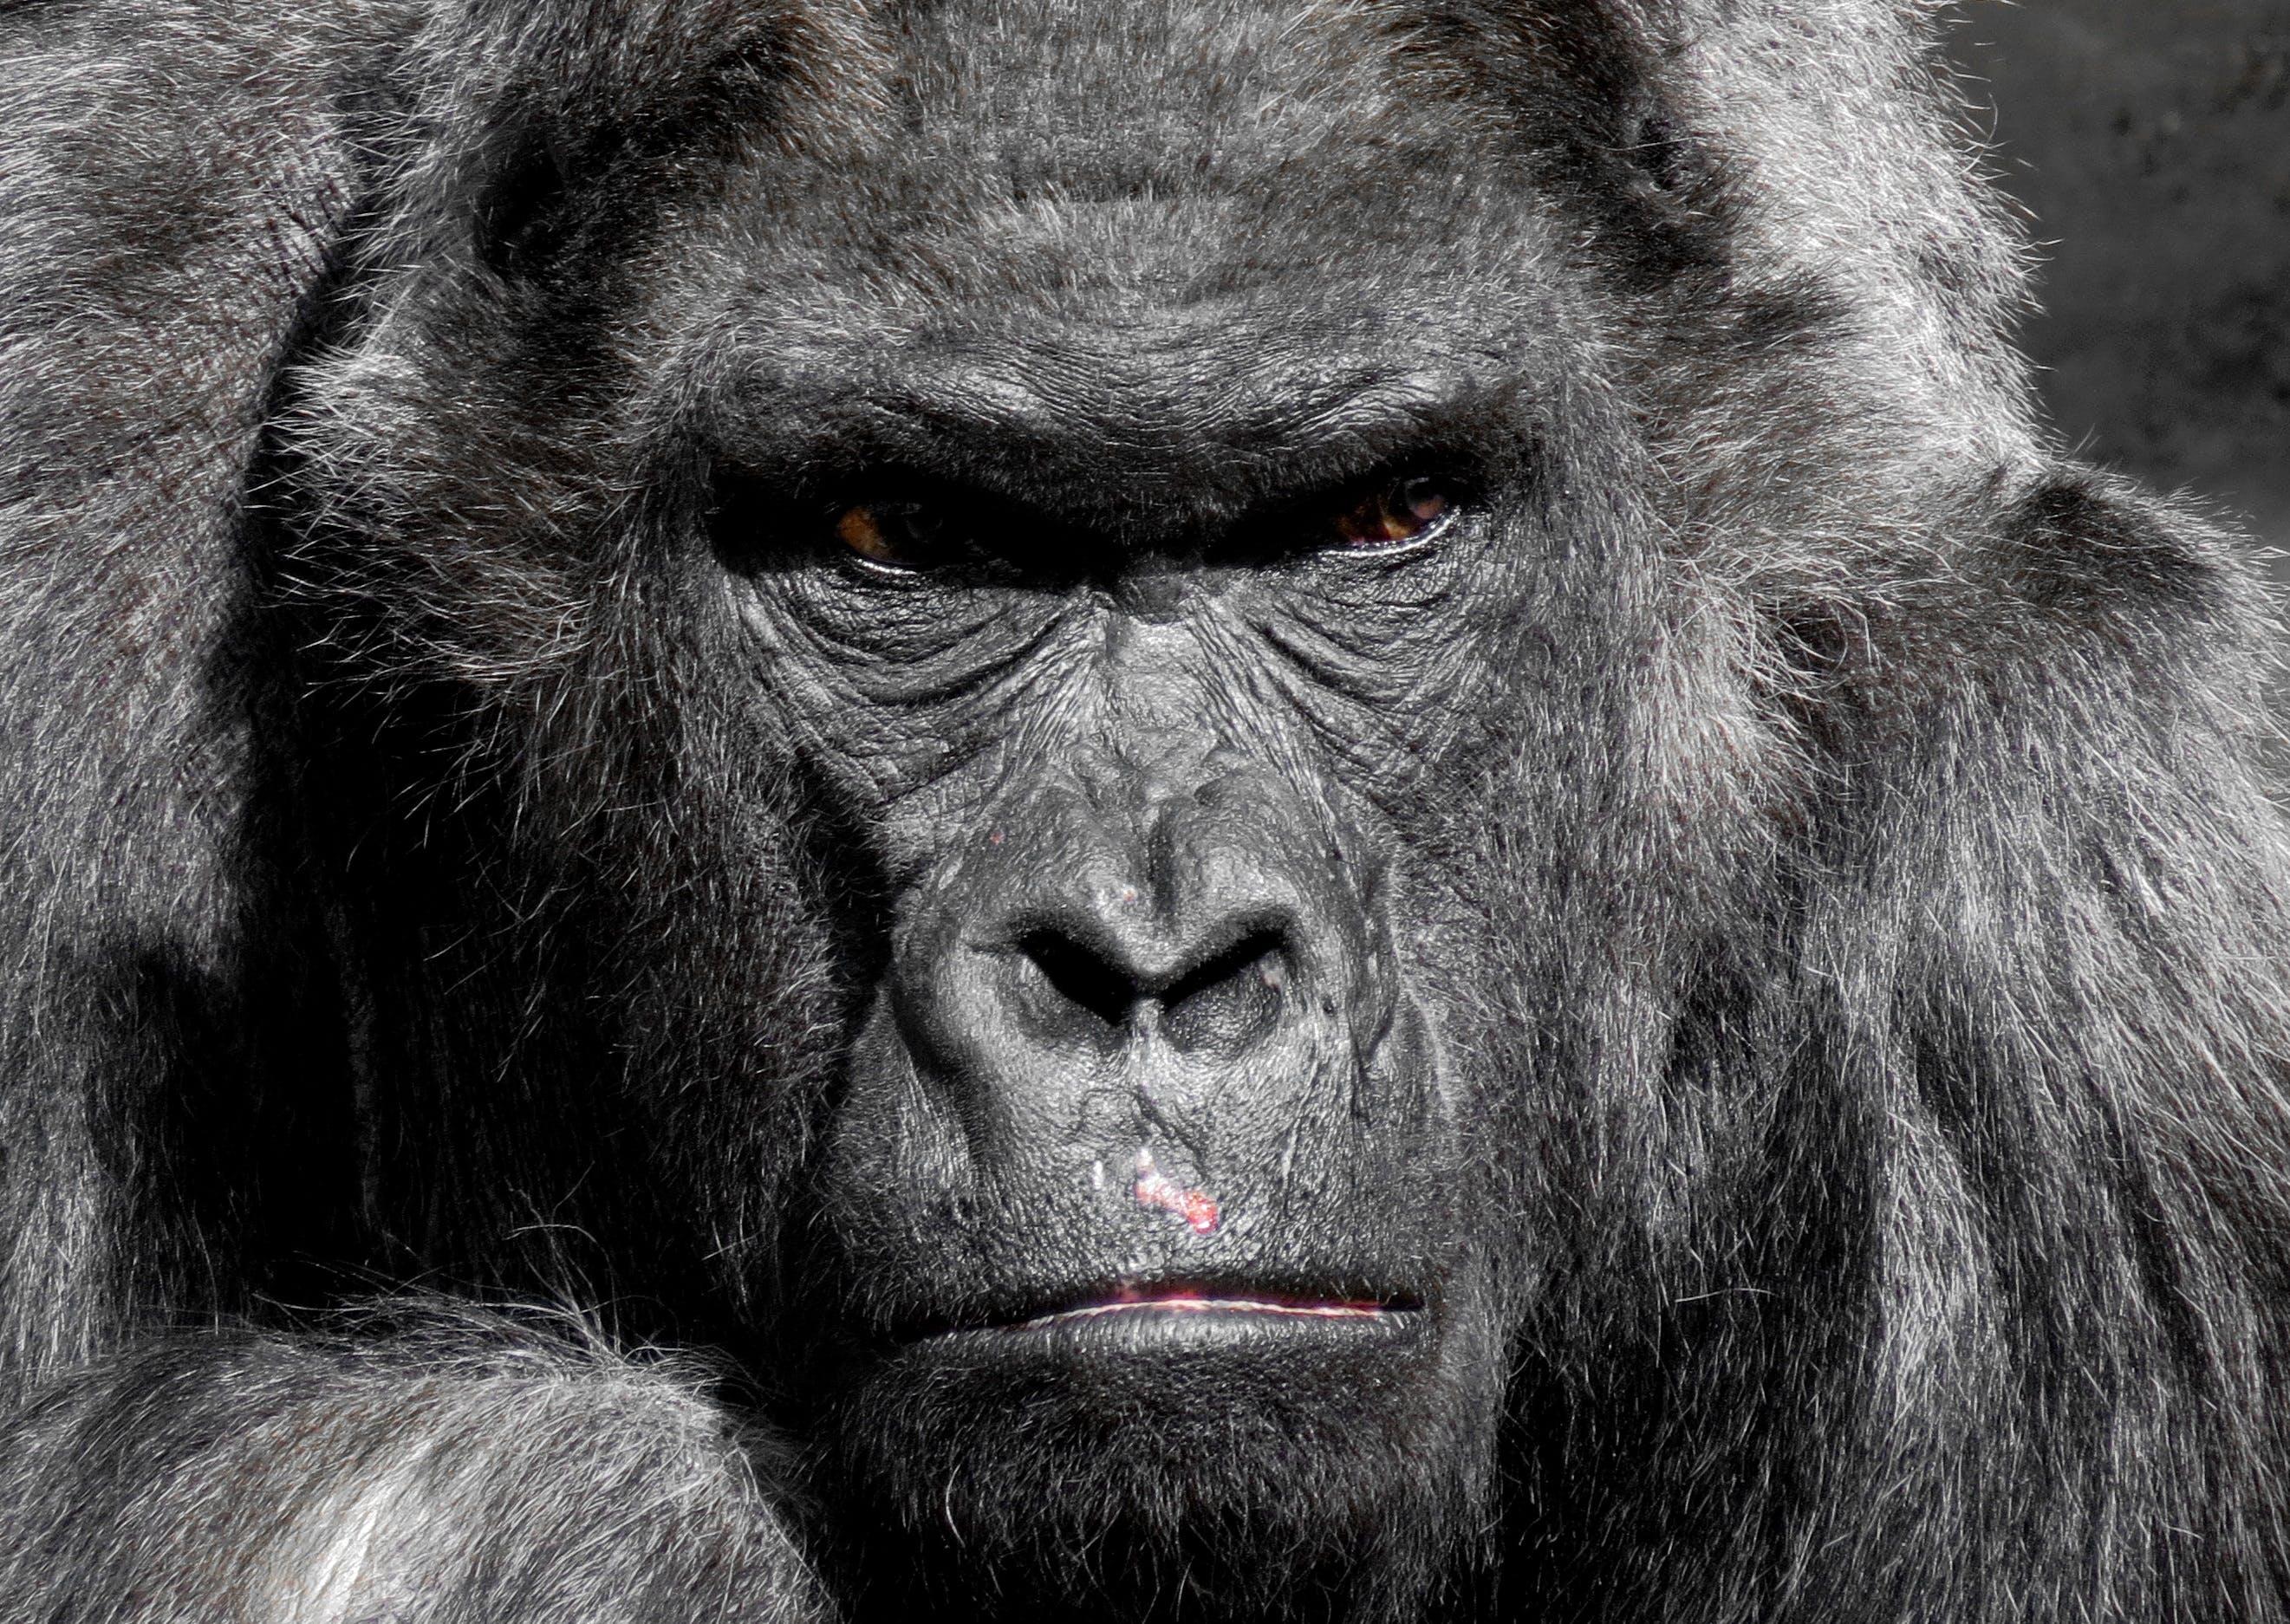 Gorilla Animal